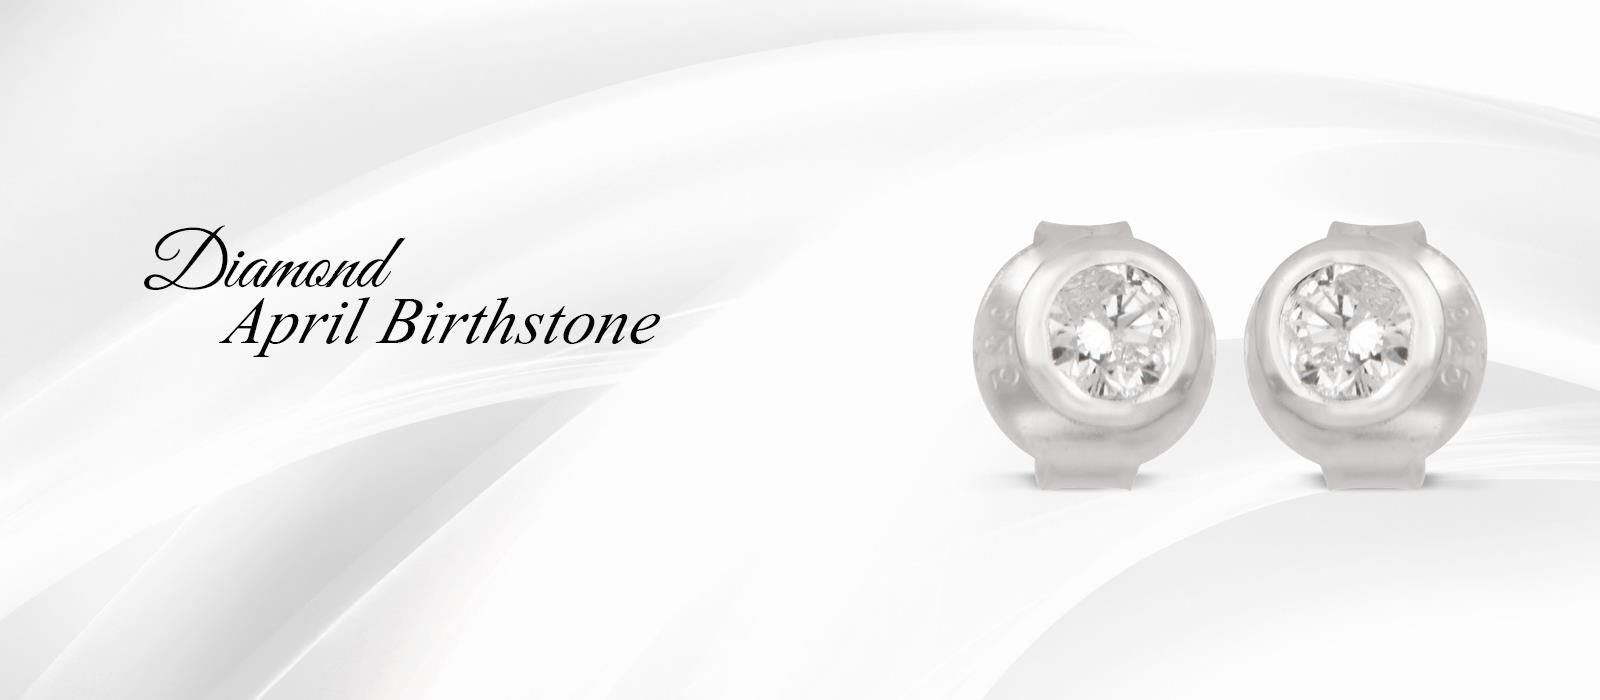 pave diamond jewelry manufacturer, Fabricante de joyas de diamante pavimentar, bane diamant smykker producent, Fabricant de bijoux en diamant, Pflastern Diamant-Schmuck-Hersteller, spianare produttore di gioielli con diamanti, customized diamond jewelry manufacturer